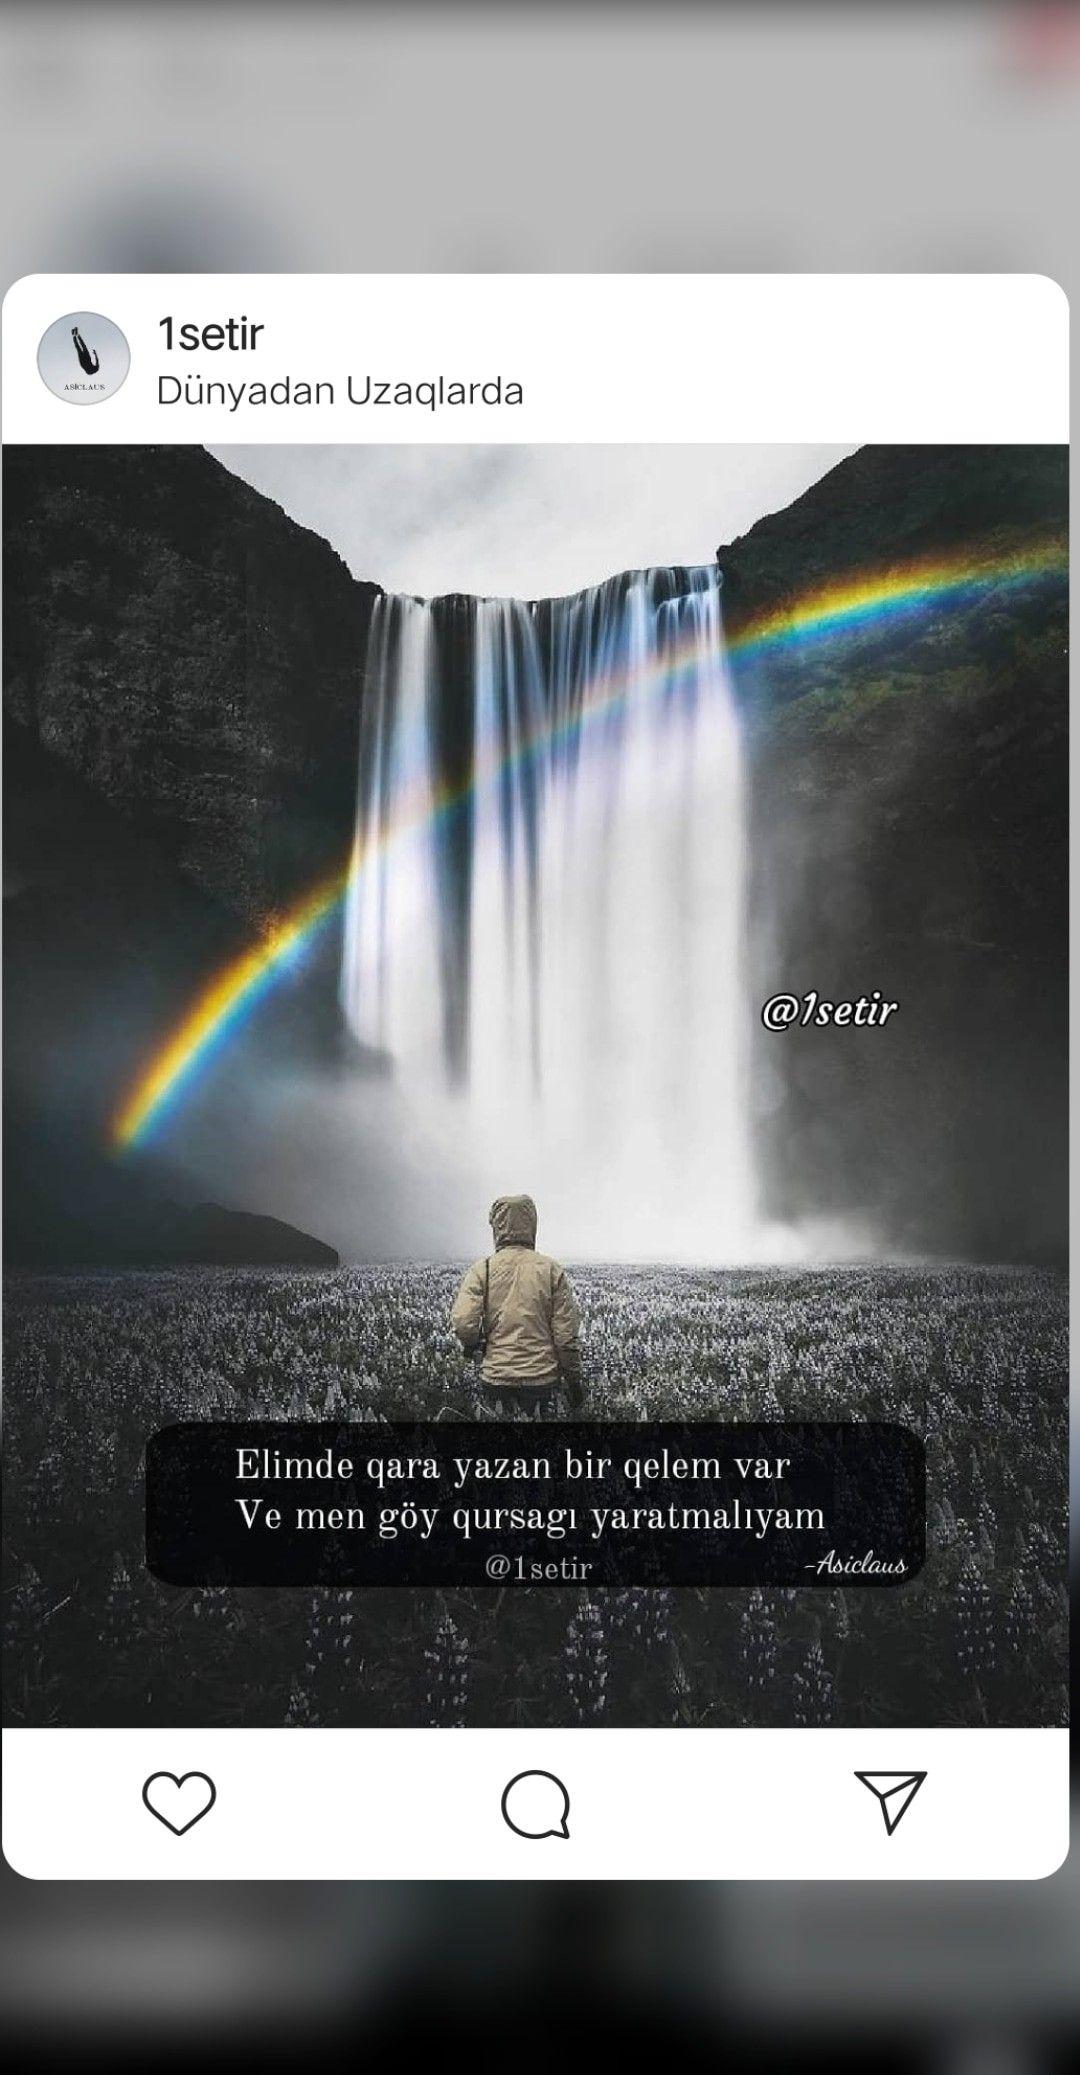 Azerbaycanca Sozler Yazili Resimler Status Resimleri Yazili Sekiller Seir Sevgi Paylasimlari Ayriliq Outdoor Waterfall Lockscreen